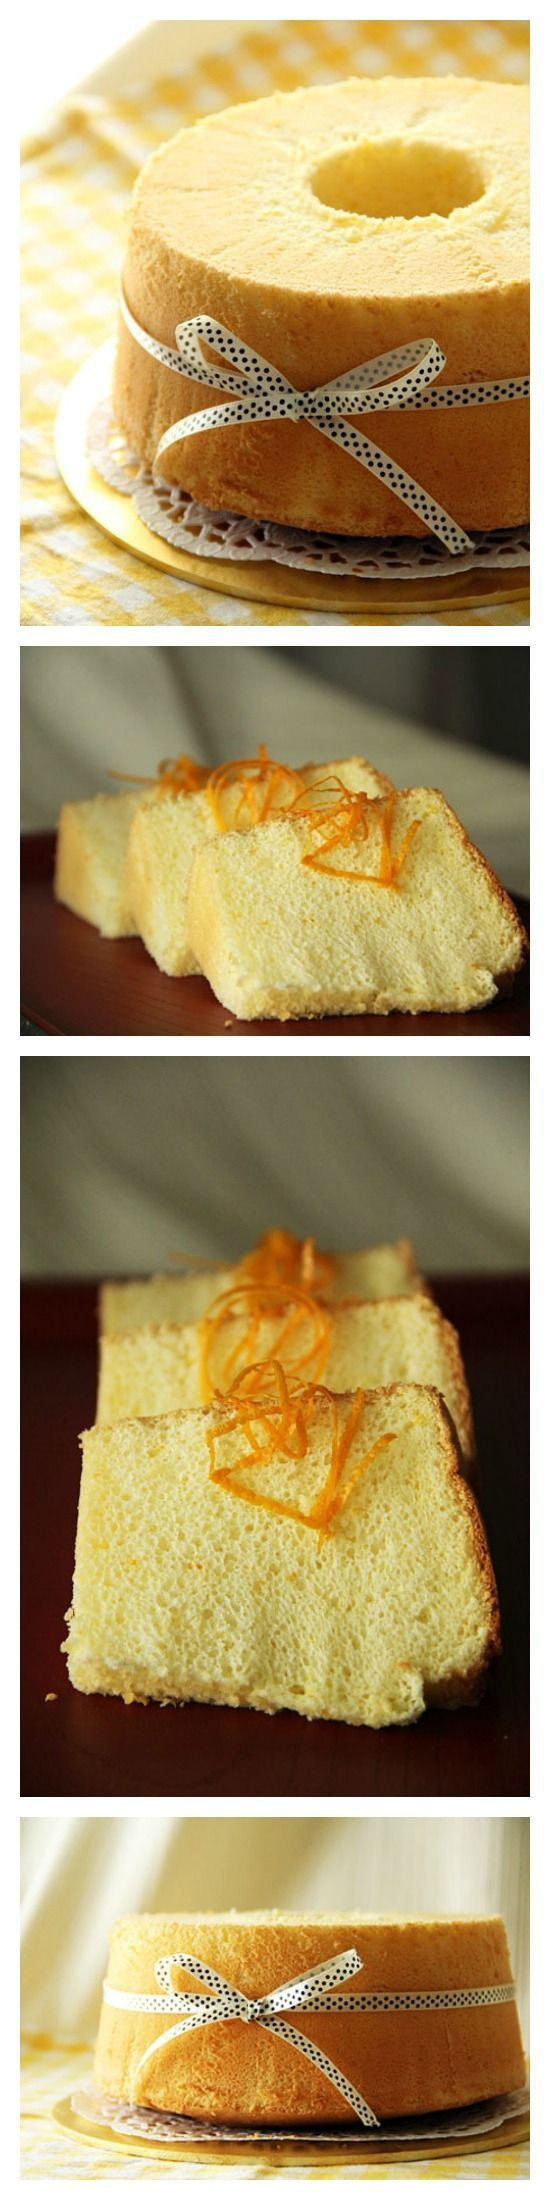 Orange Chiffon Cake Recipe – Airy, light, cottony, and to-die-for orange sponge cake. You've got to make it. Click for recipe. | rasamalaysia.com